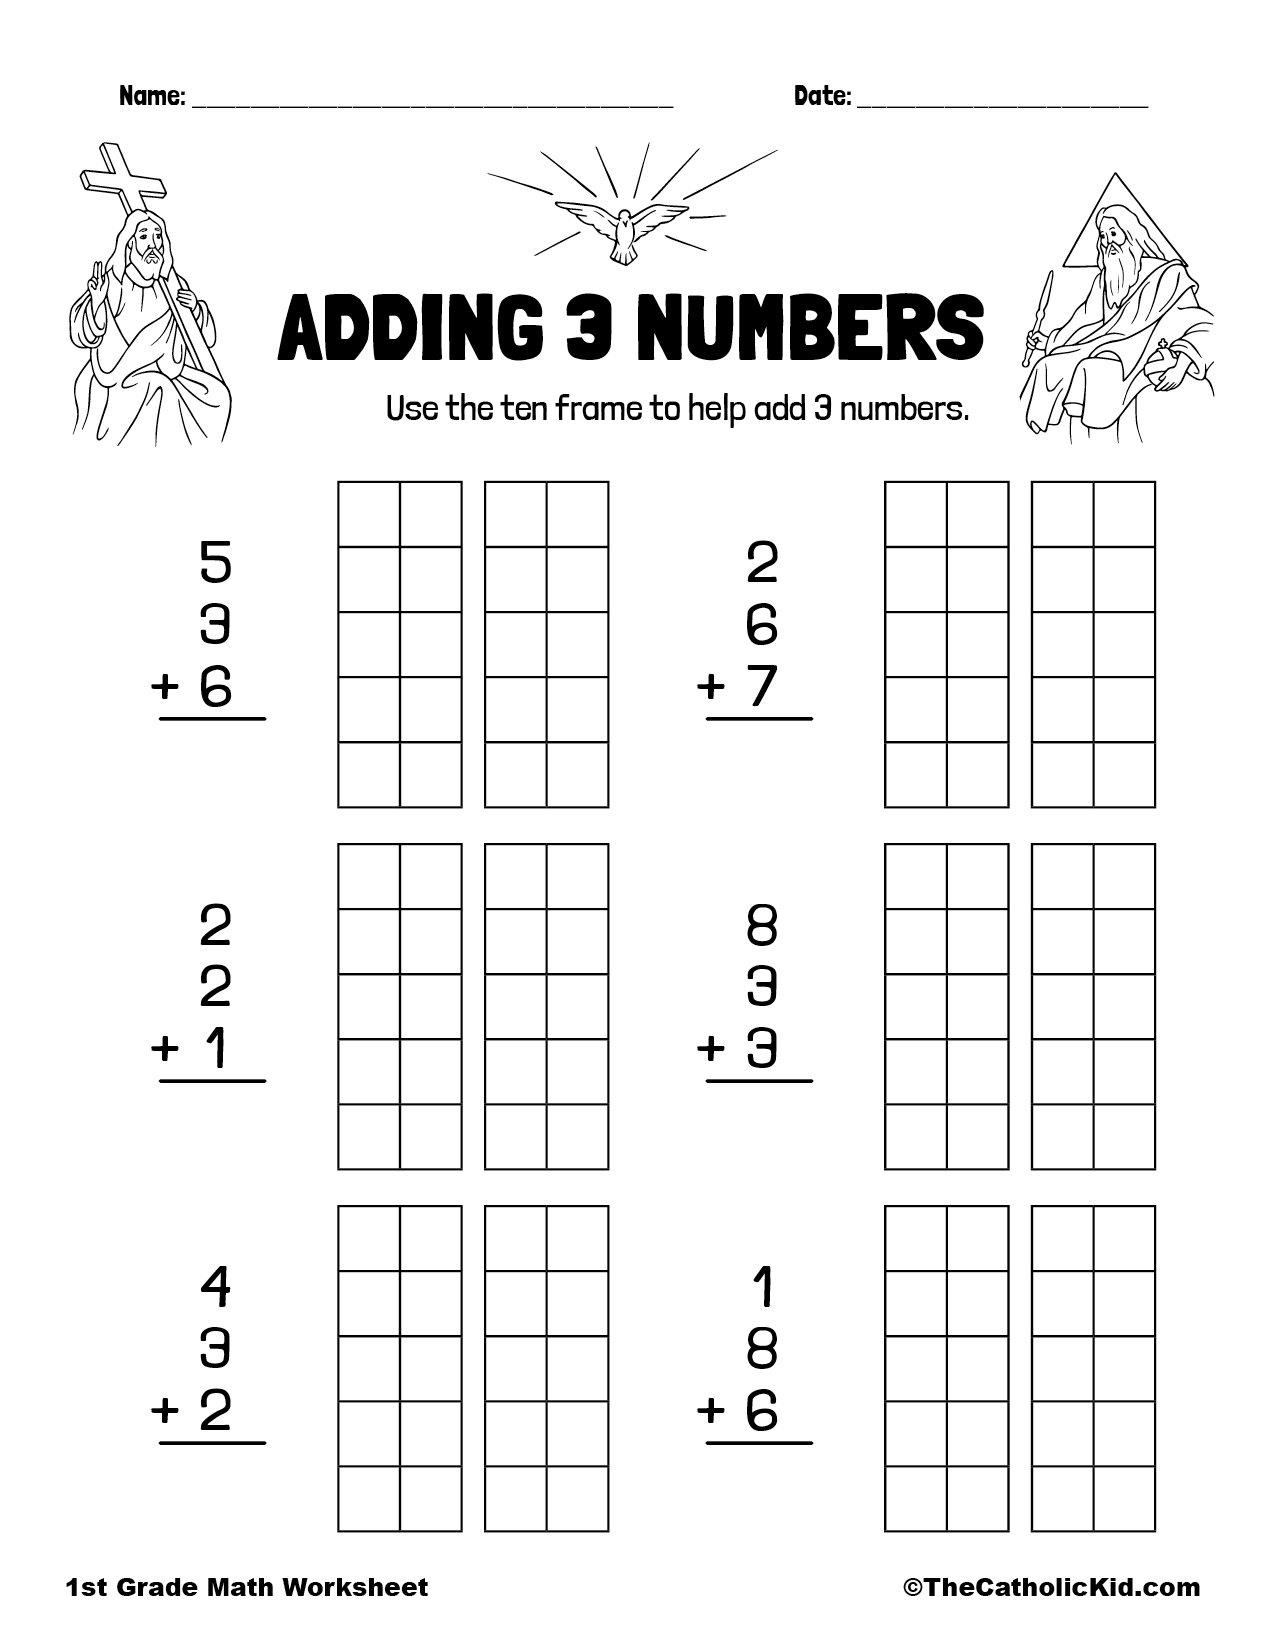 1st Grade Math Catholic Themed Worksheet Adding 3 Numbers